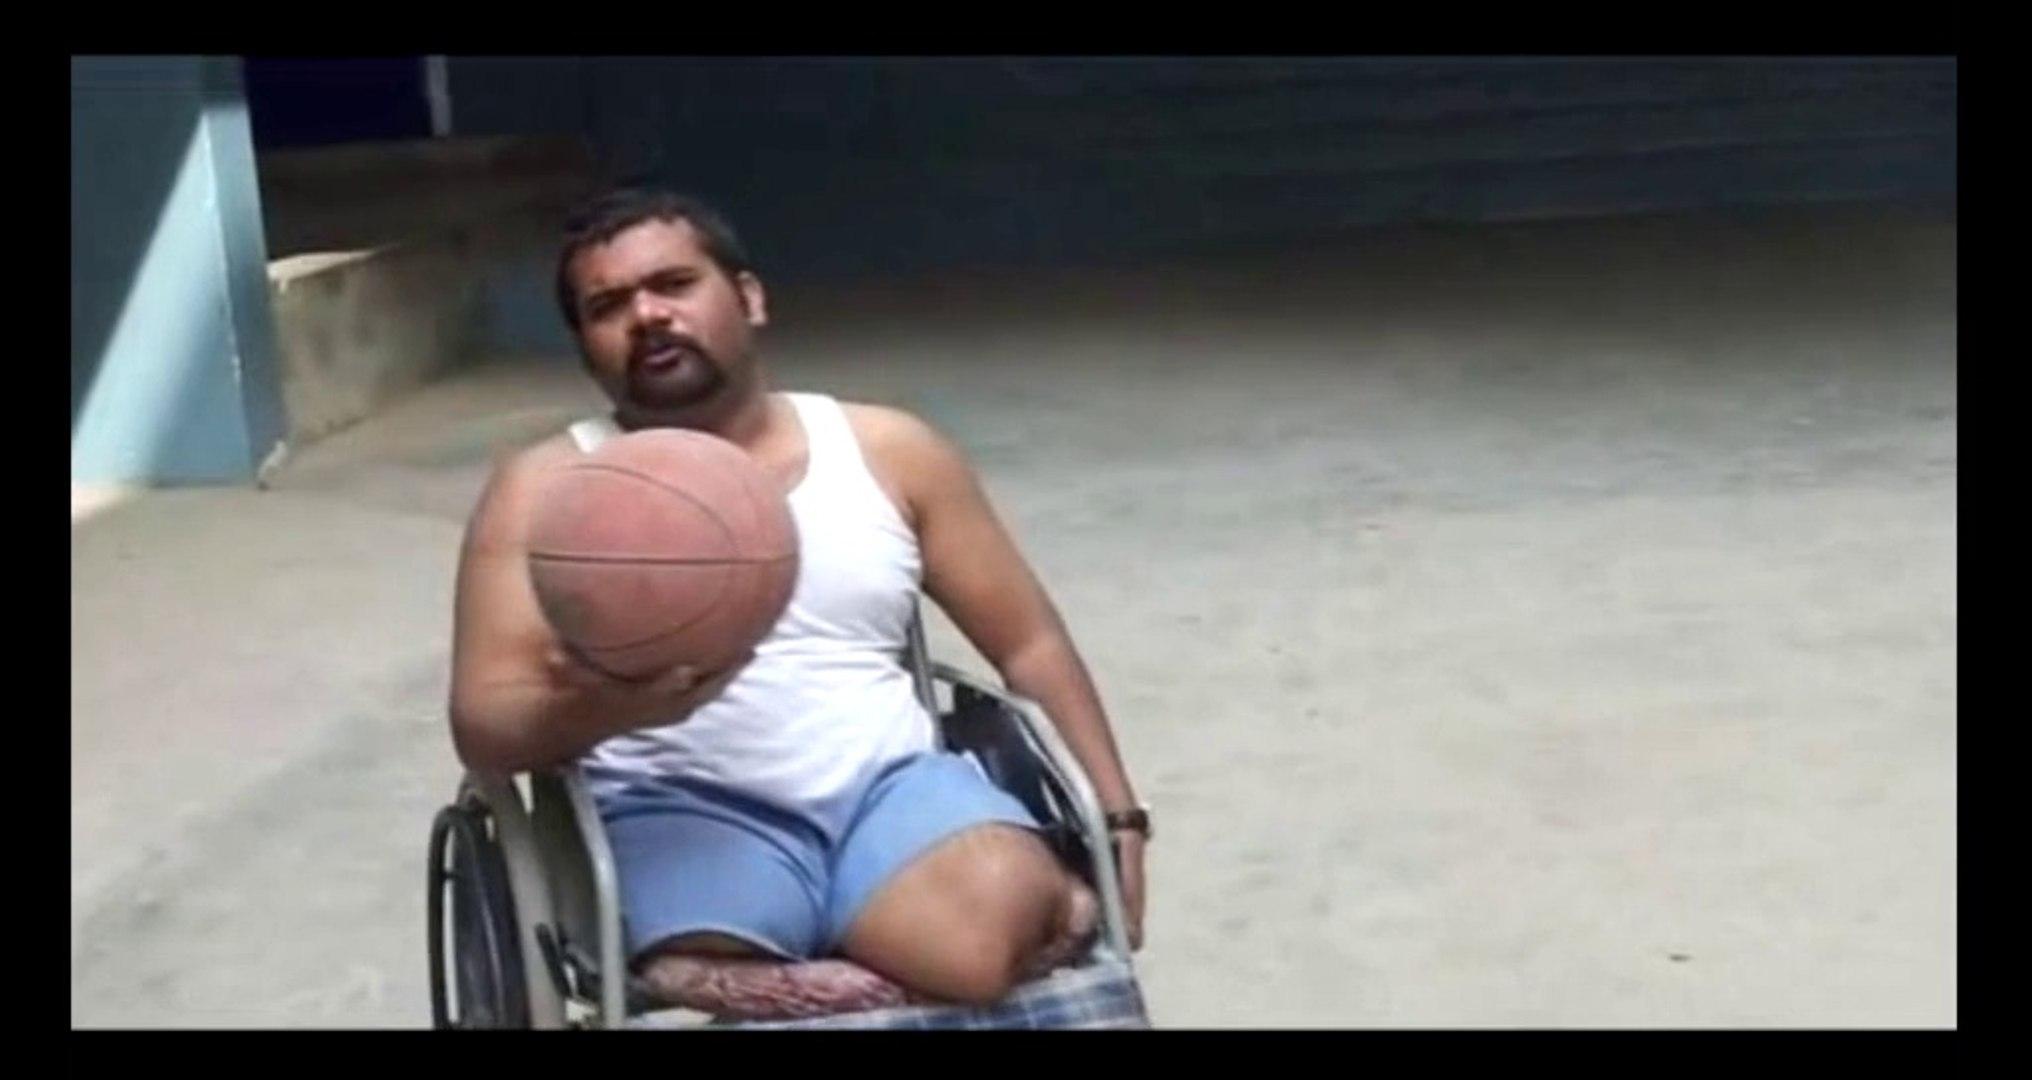 Double Amputee David: I'm playing basketball